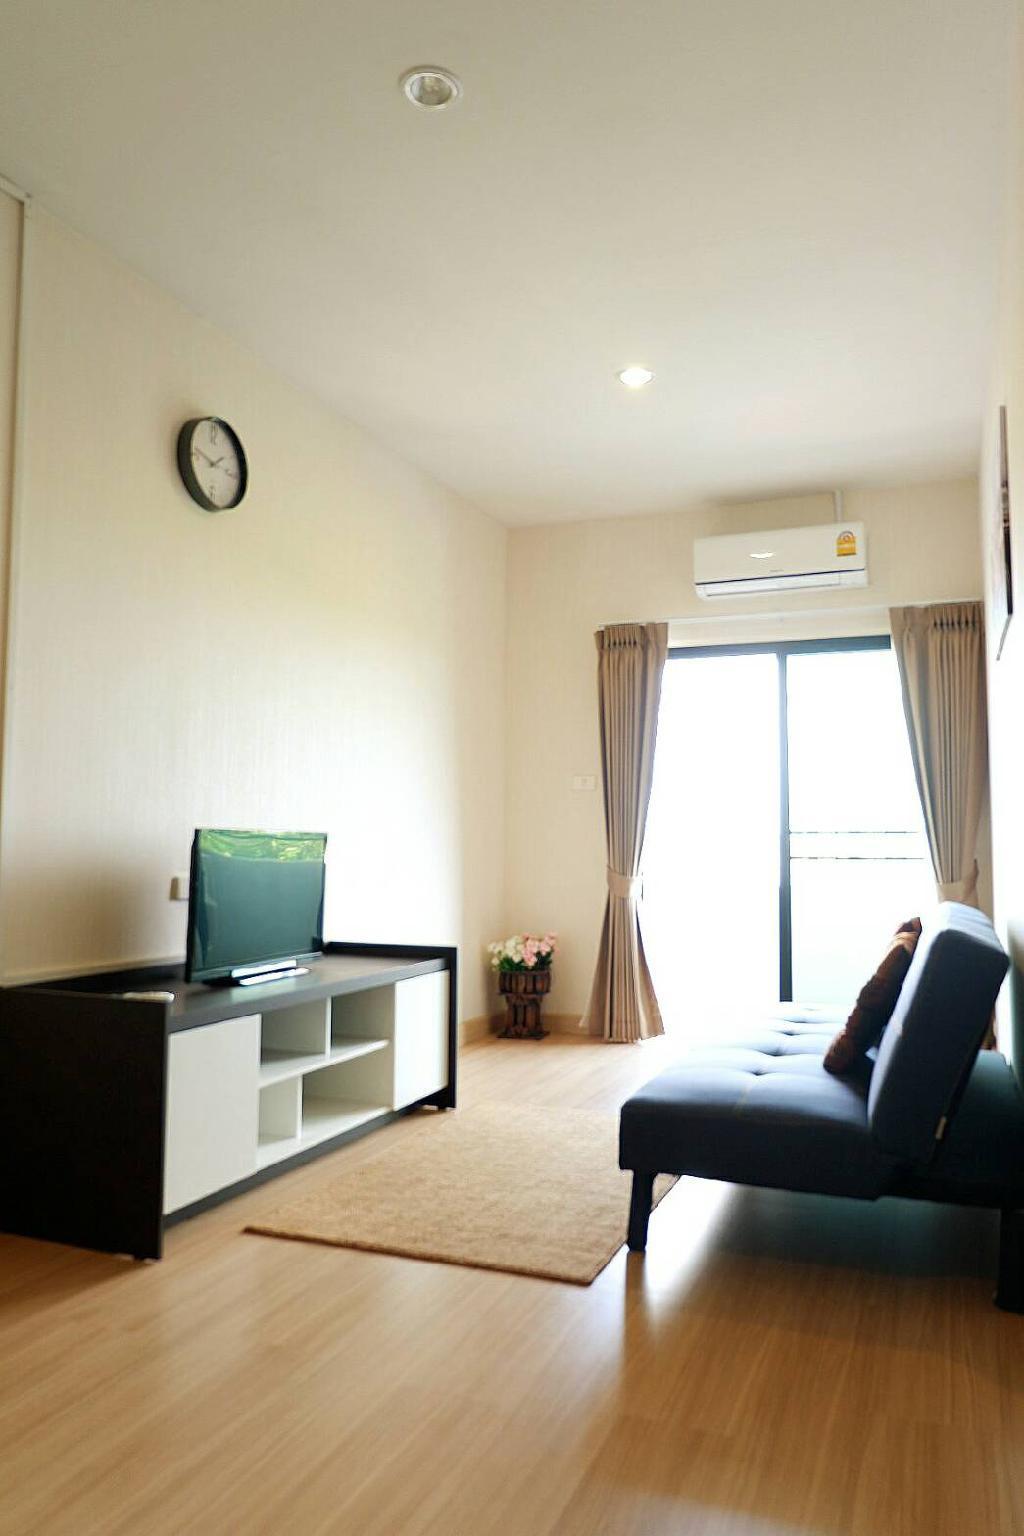 TandW Room